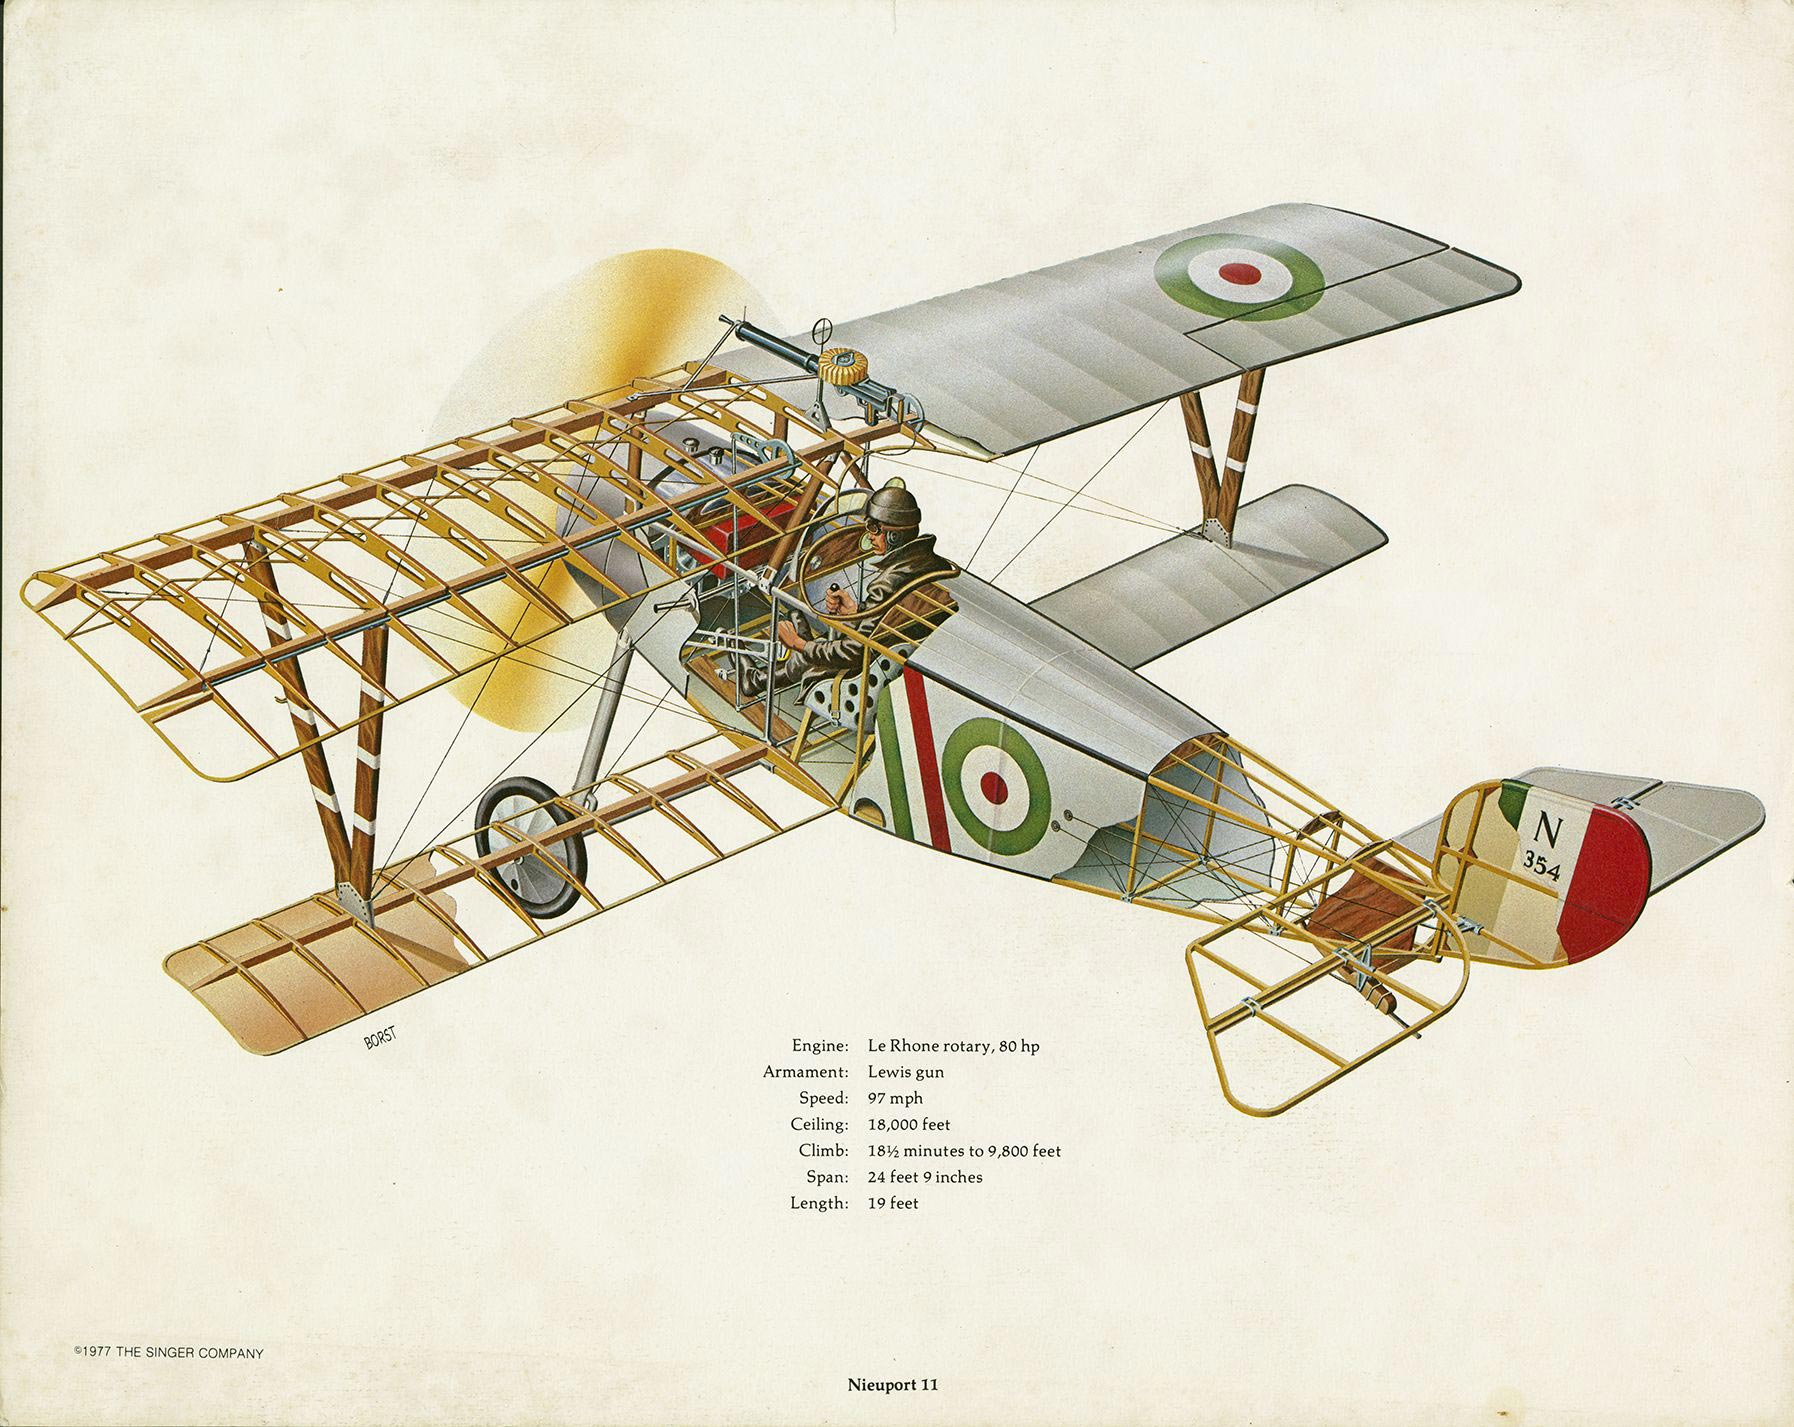 Nieuport 11 cutaway drawing